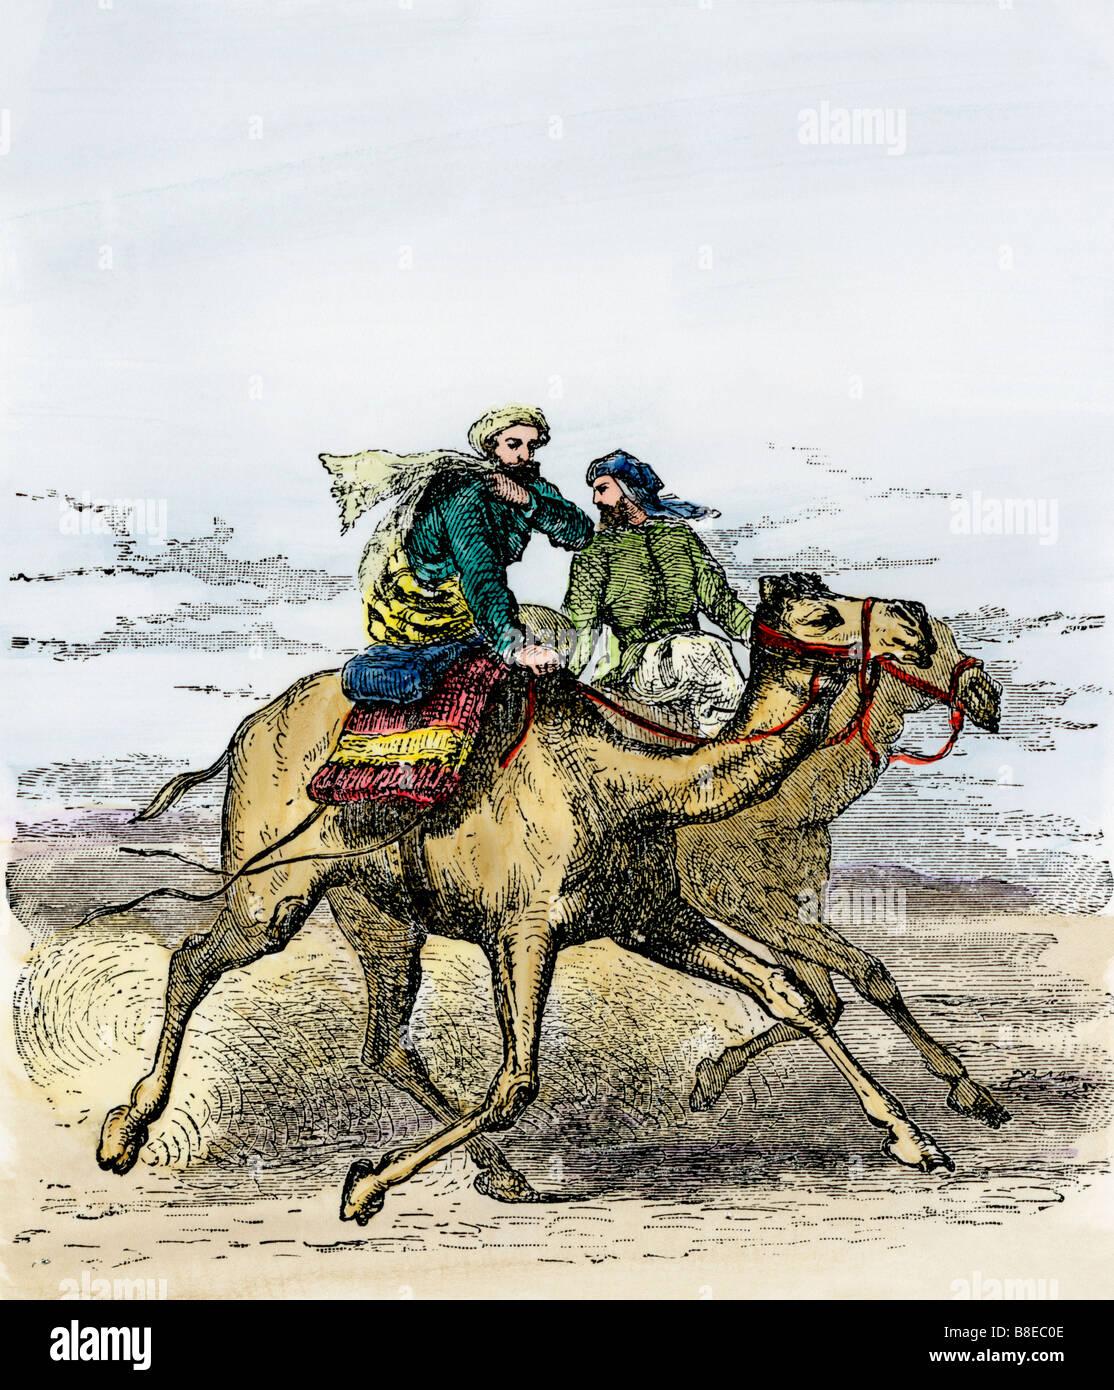 The Hegira: Muhammad traveling to Medina to establish Islam 622 AD. Hand-colored woodcut - Stock Image